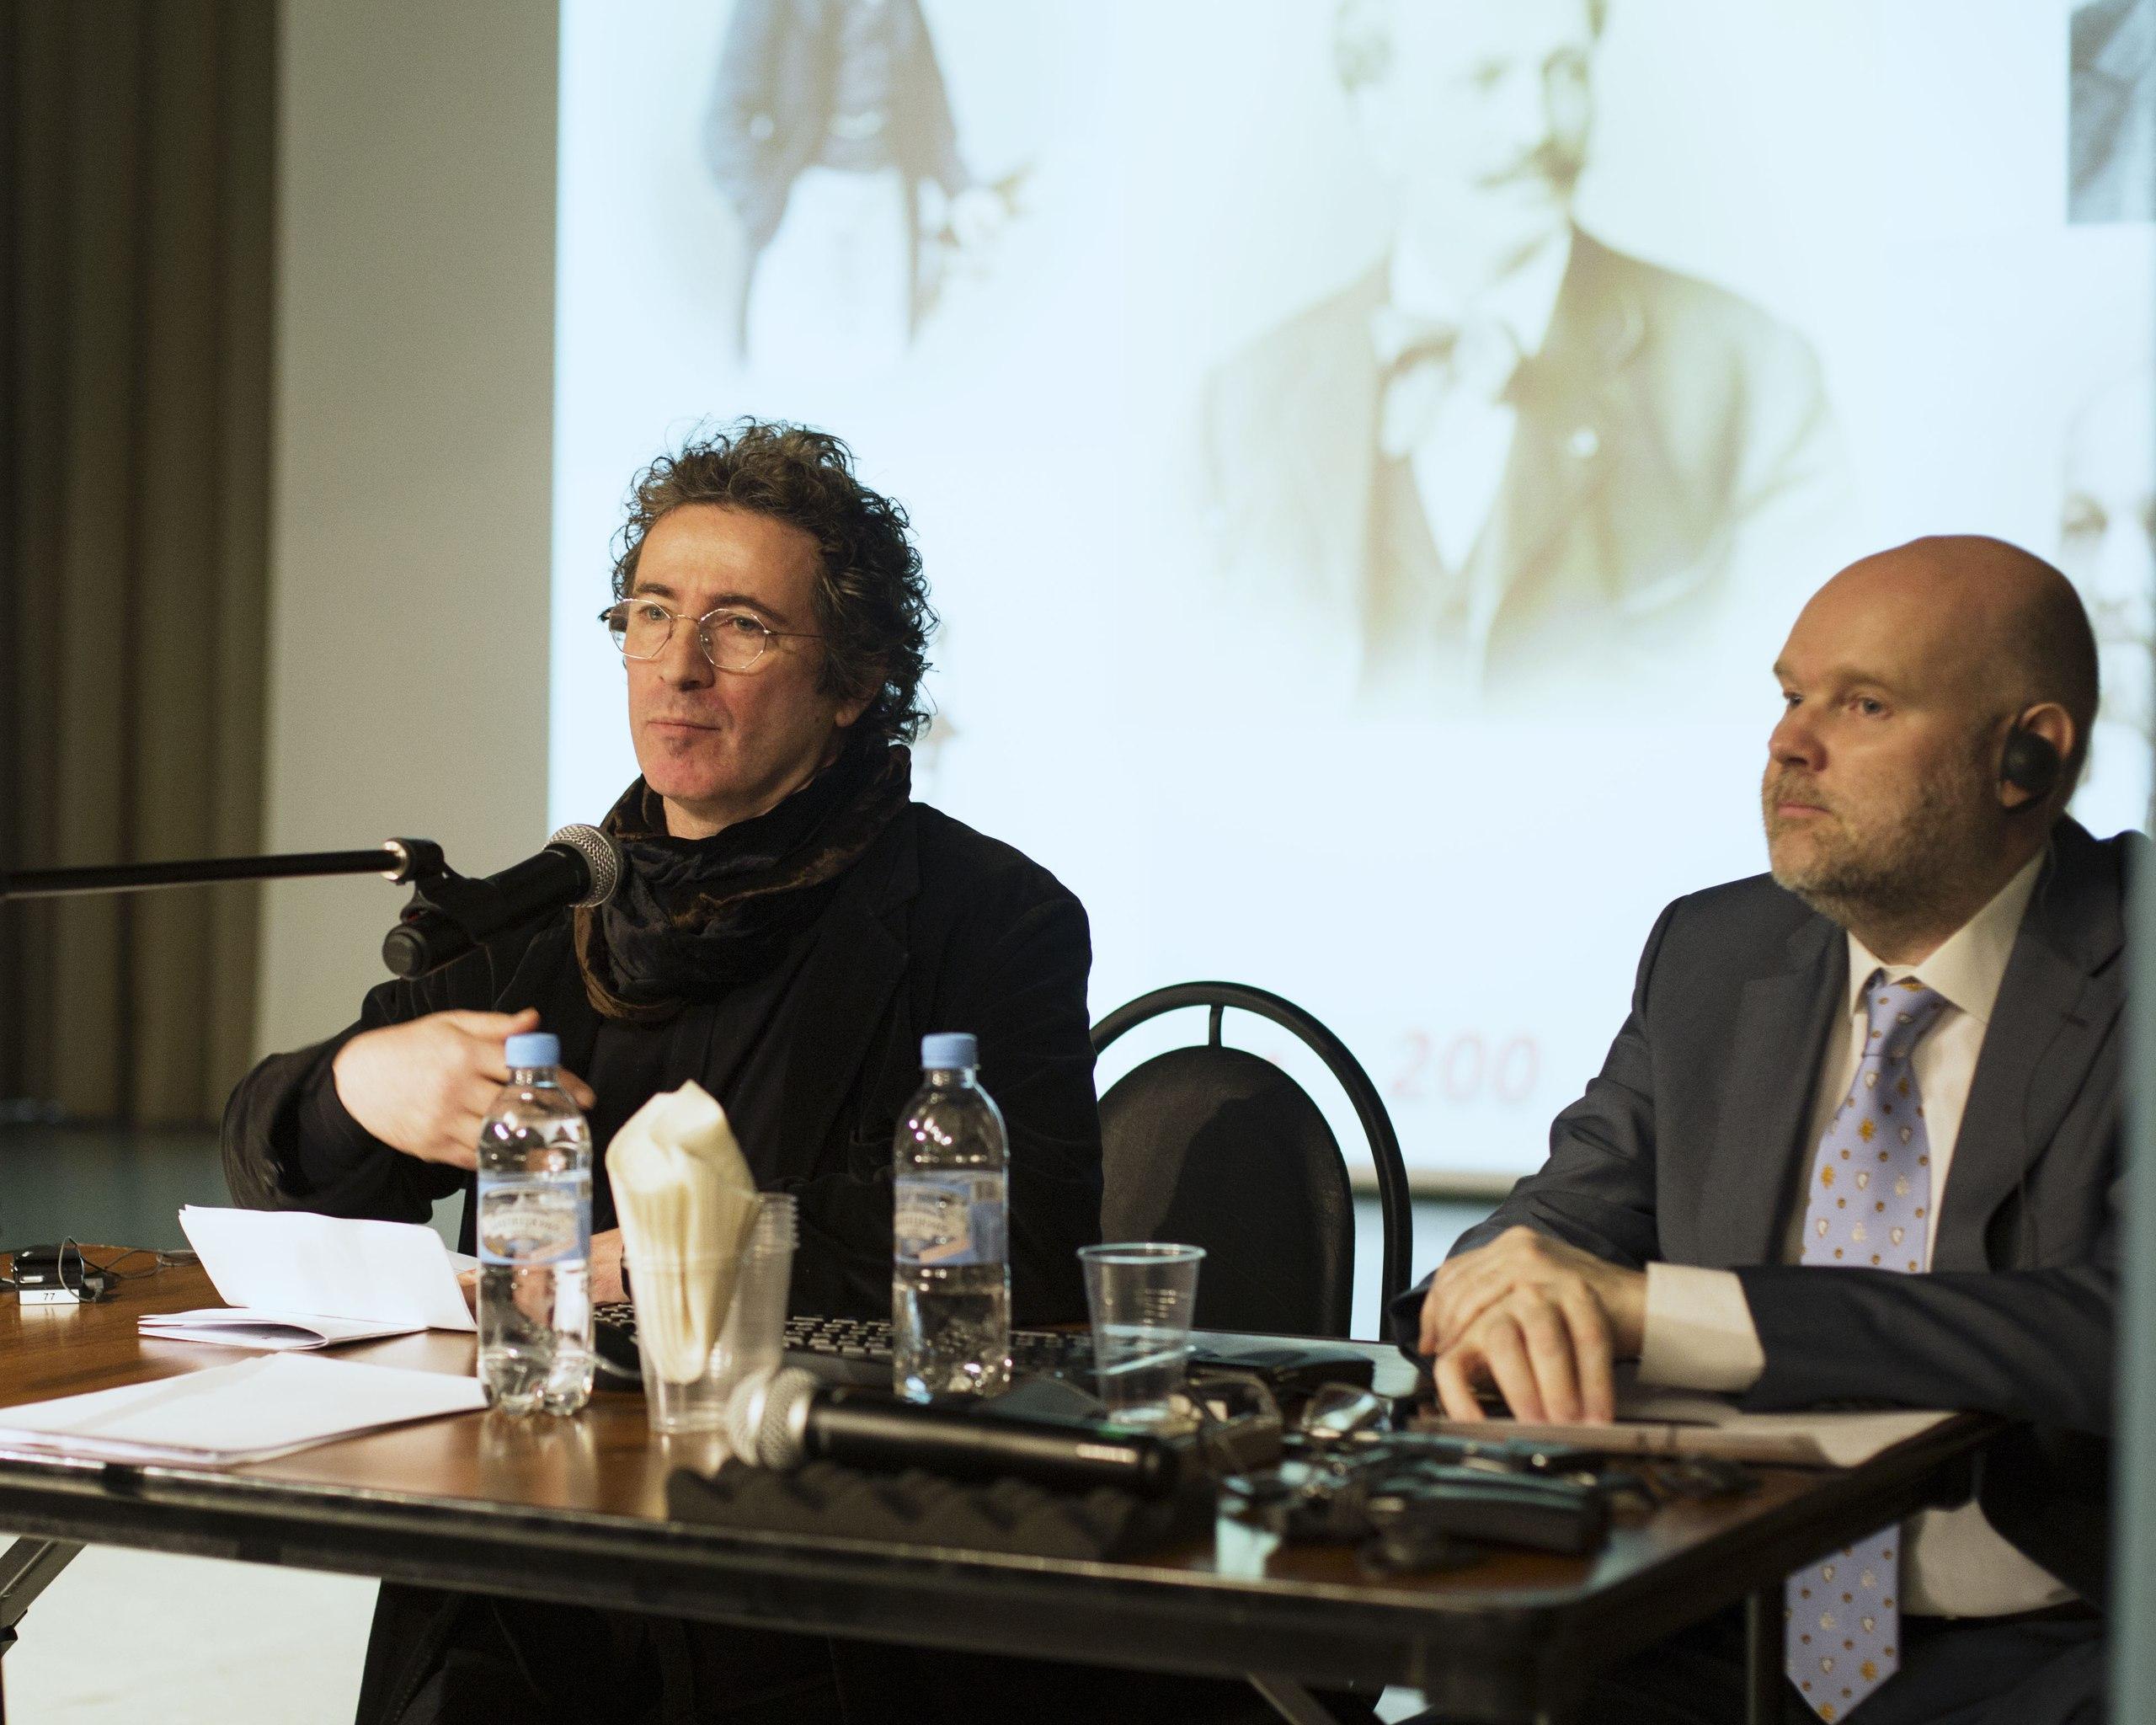 Докладчик - Антонио Канделоро, ведущий - Борис Илларионов.